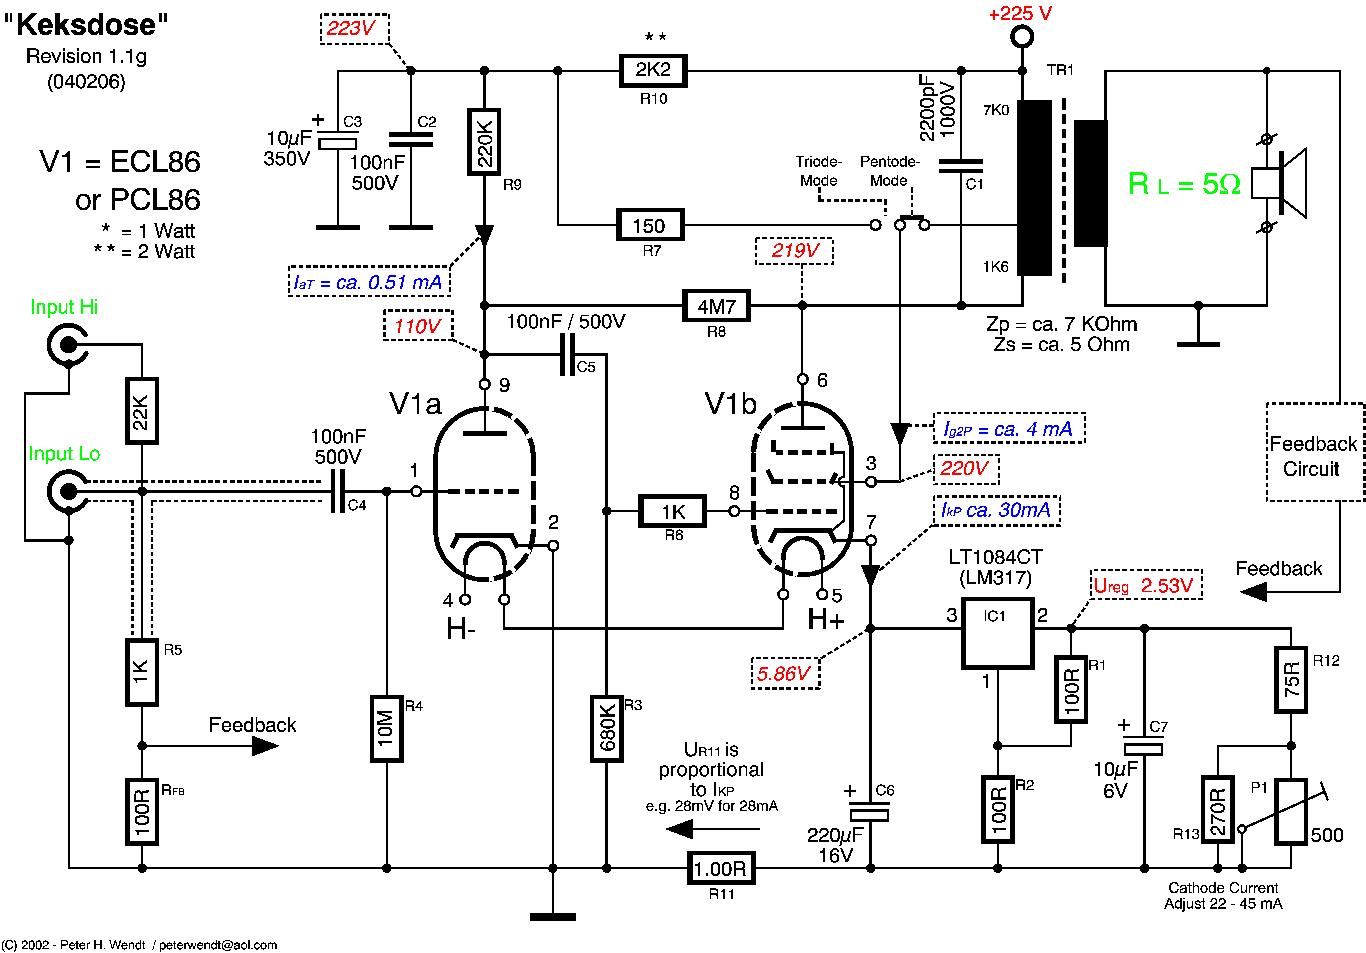 Construa O Seu Amplificadoe 2 Watt Amplifier Circuit Http Mcamafiade Tubes Keksdose Tubedia Xxxxxxxxxxxxxxxxxxxxxxxxxxxxxxxxxxxxxxxxxxxxxxx